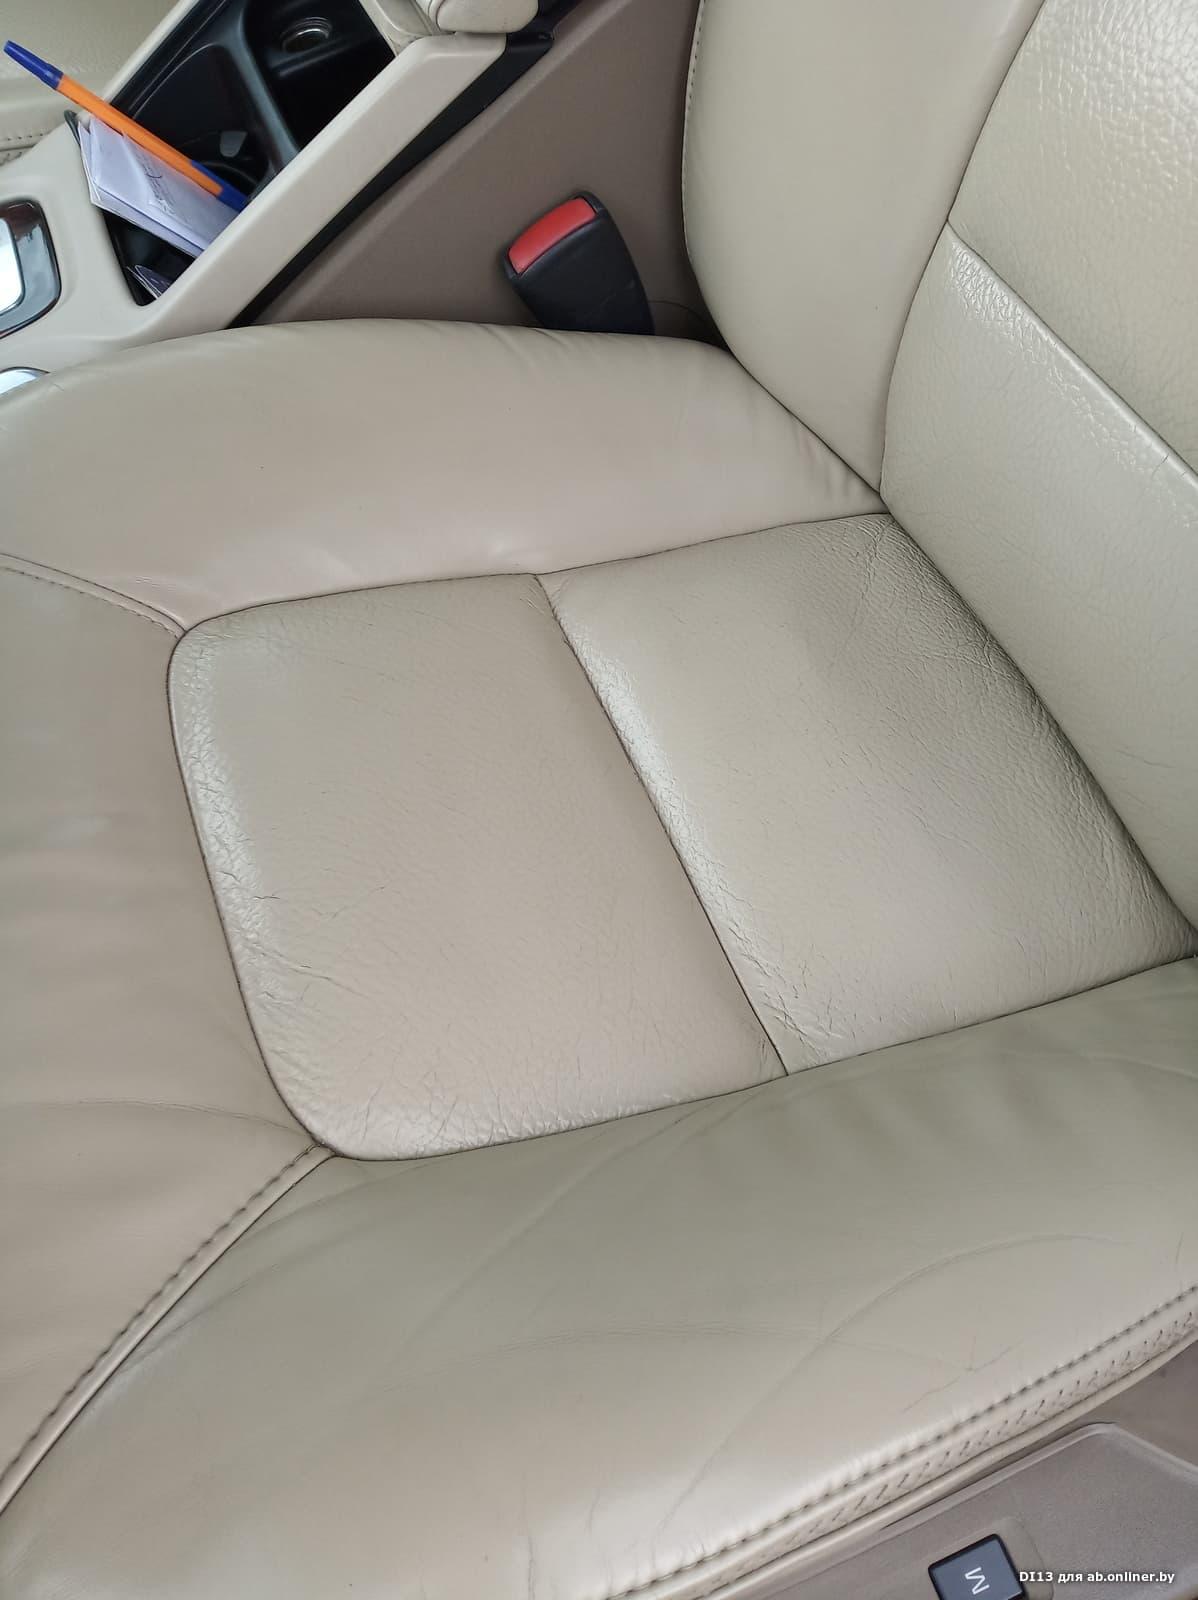 Volvo XC70 lll